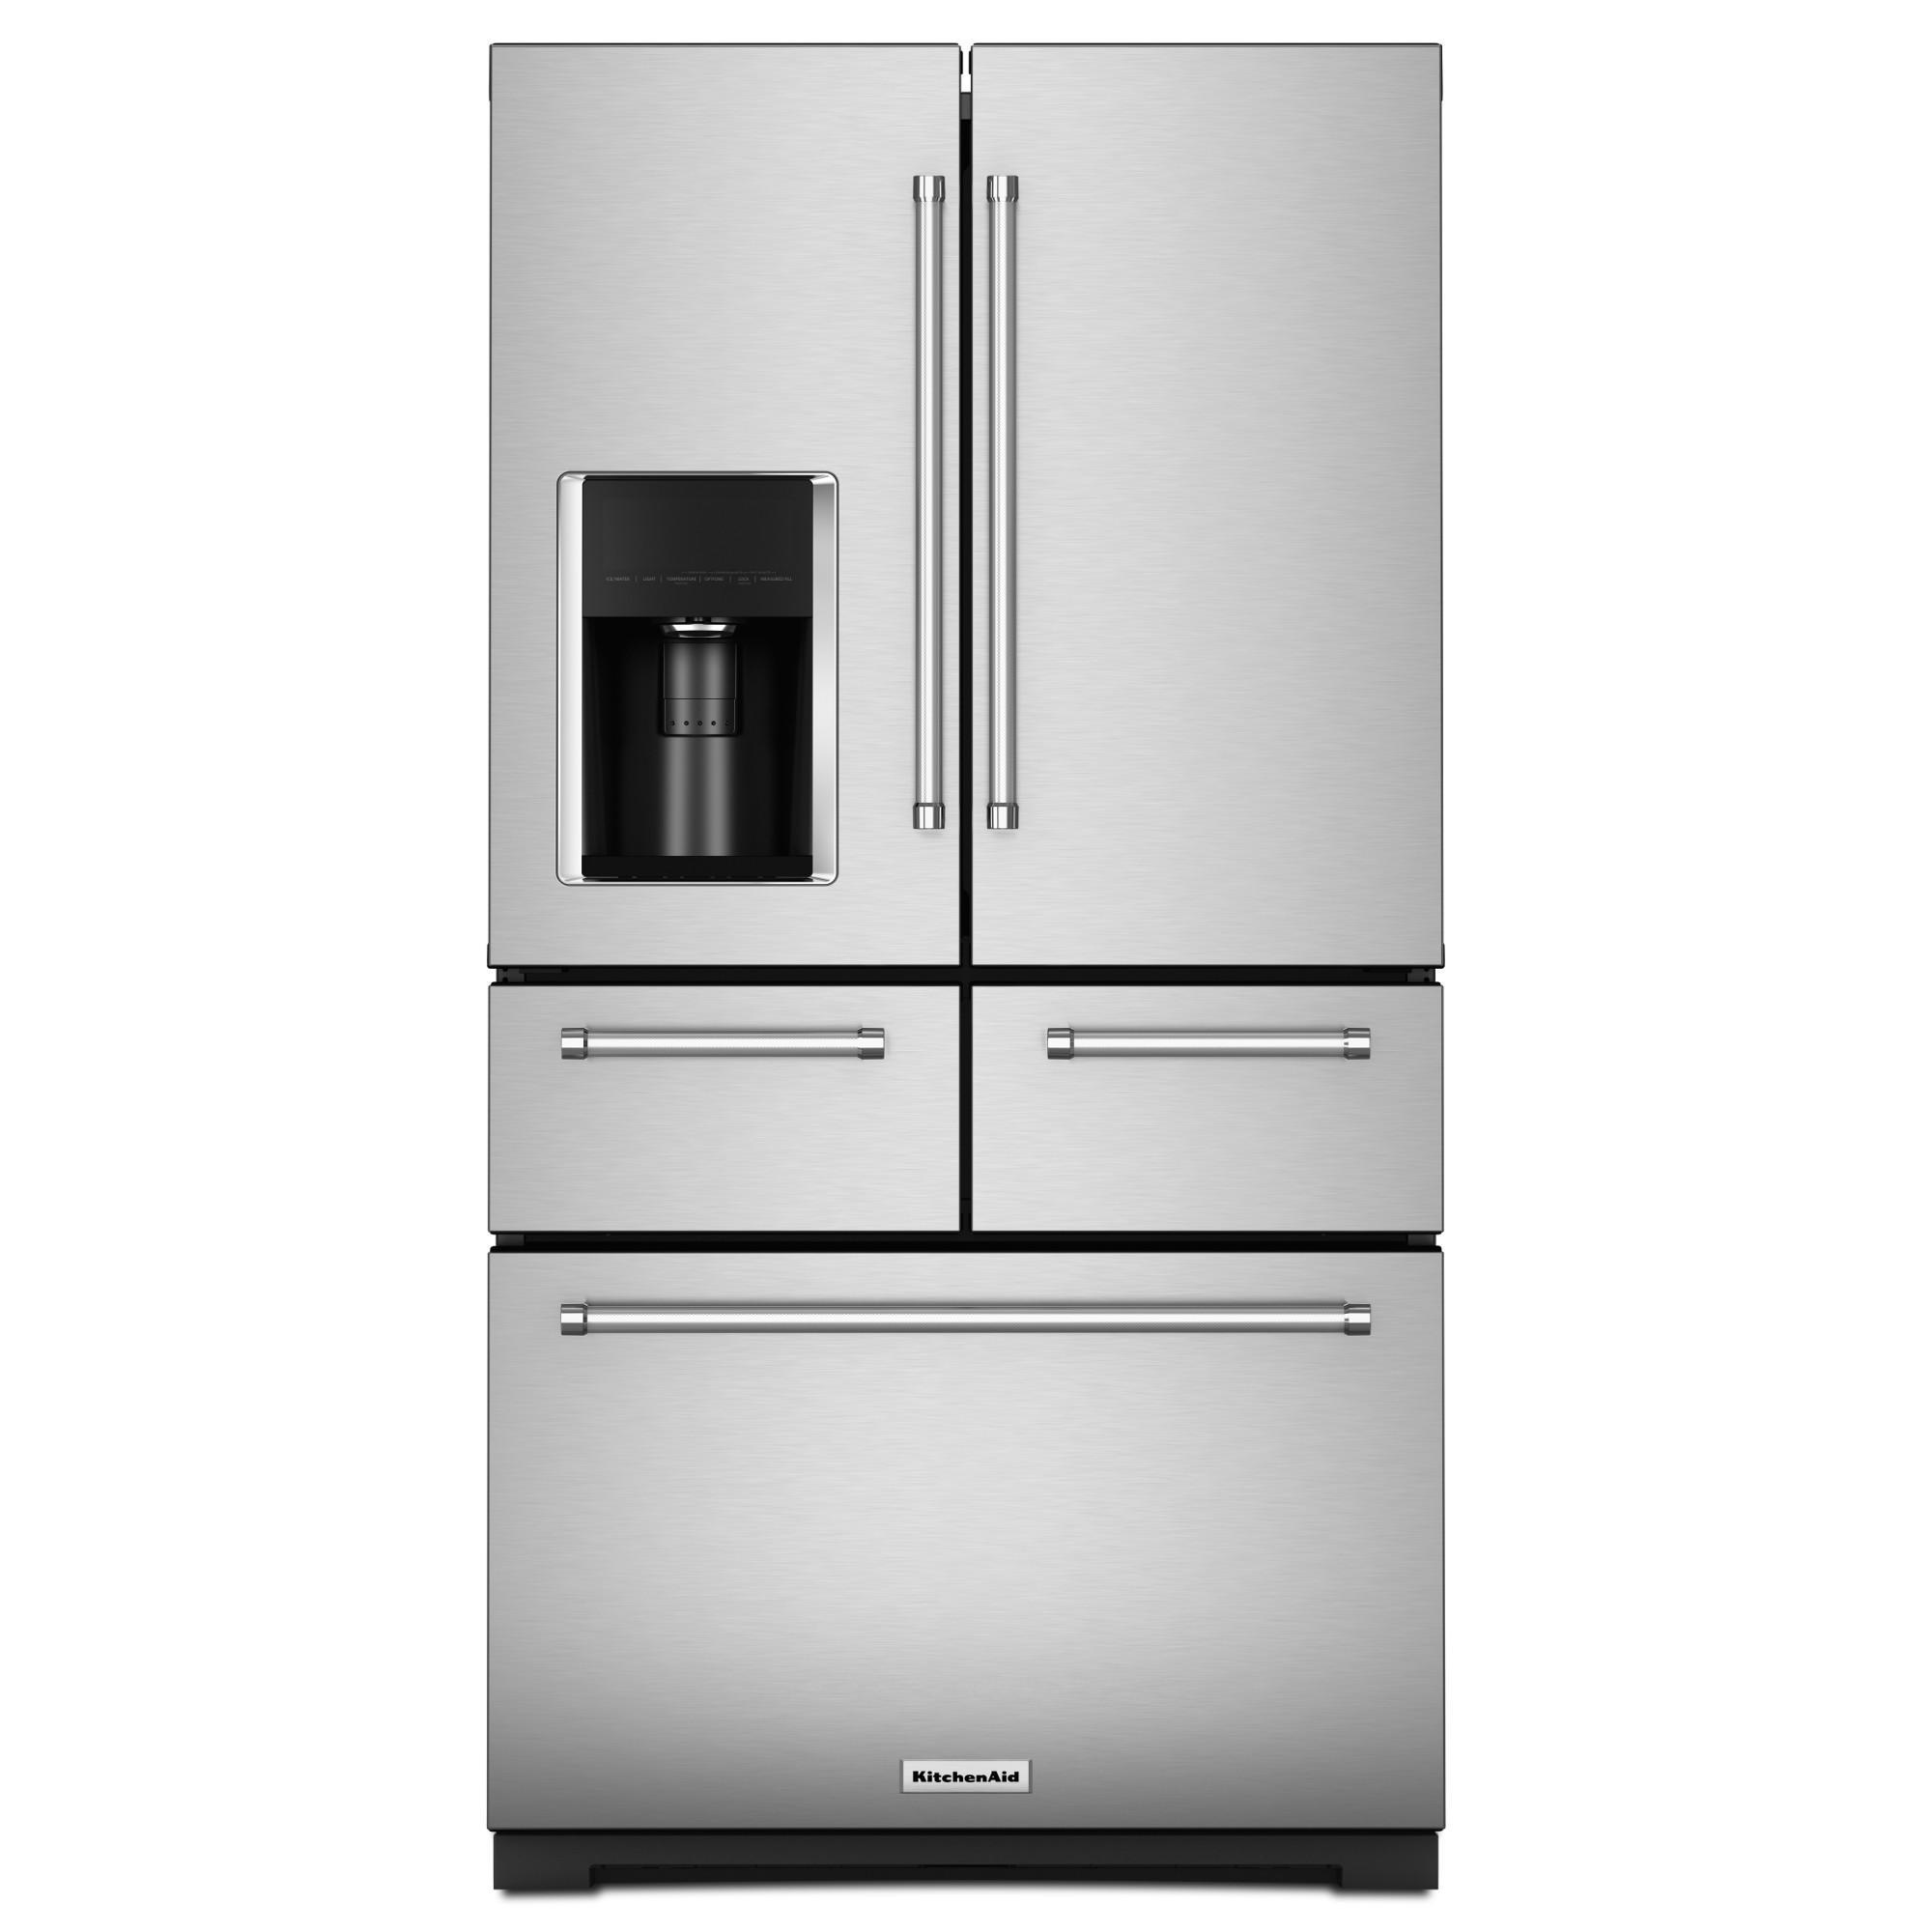 KitchenAid KRMF706ESS 25.8 cu. ft. Multi-Door Refrigerator-Stainless Steel